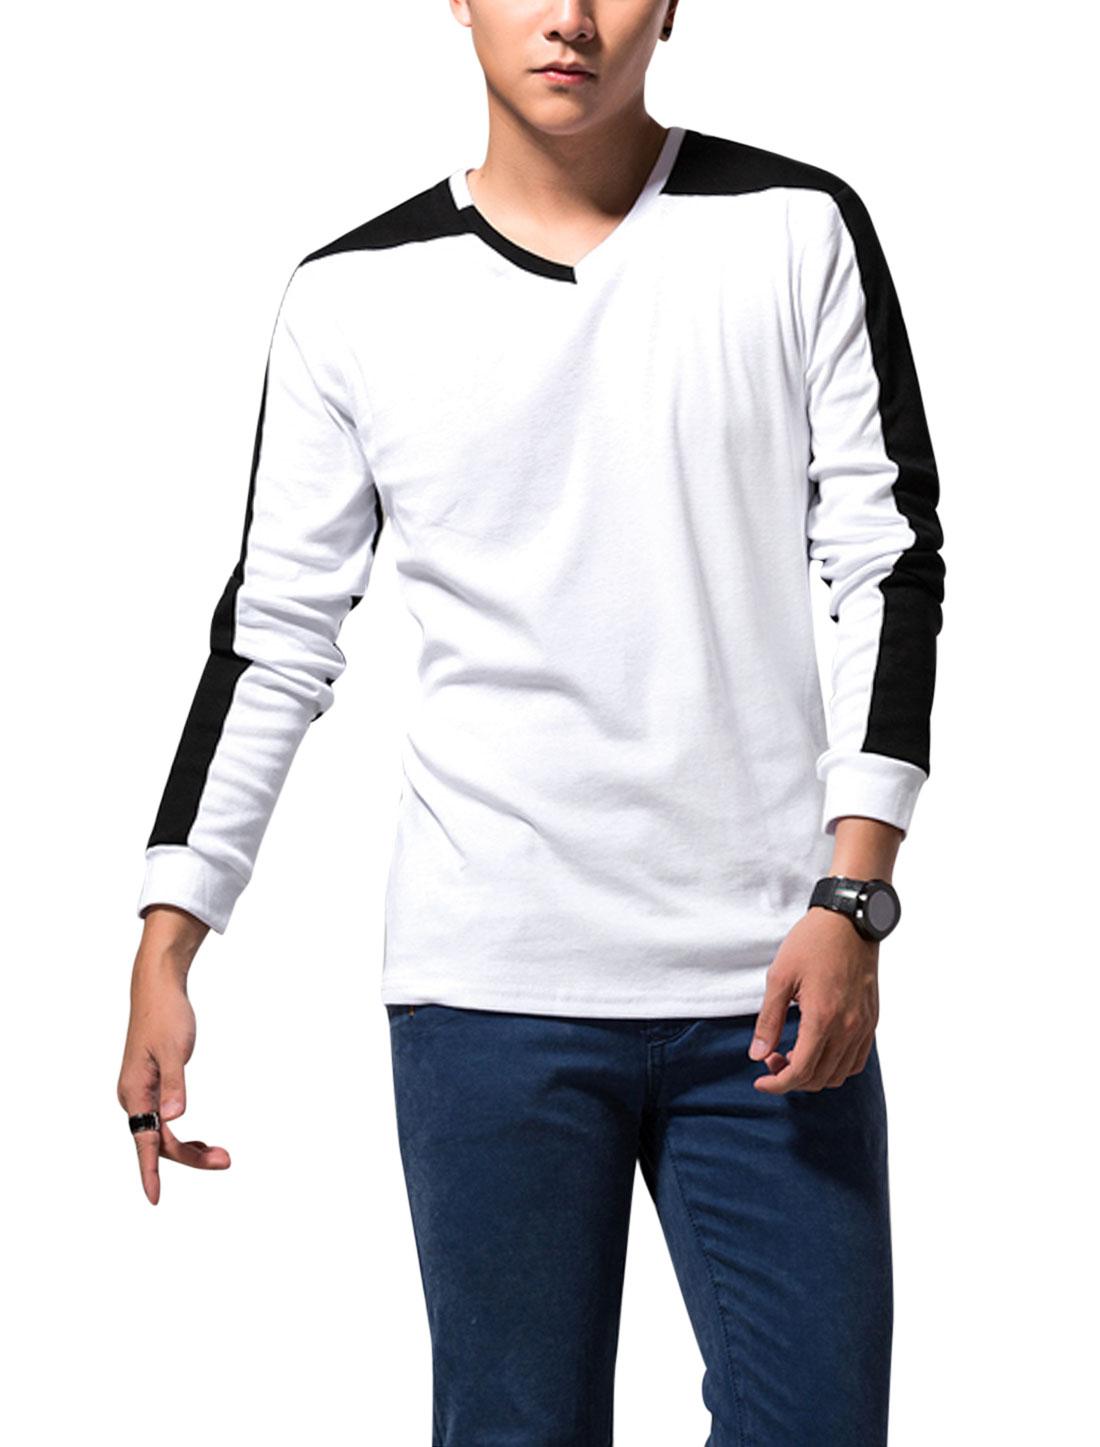 Men Stretchy Long Sleeve Colorblock Trendy Slim Tee Top White M